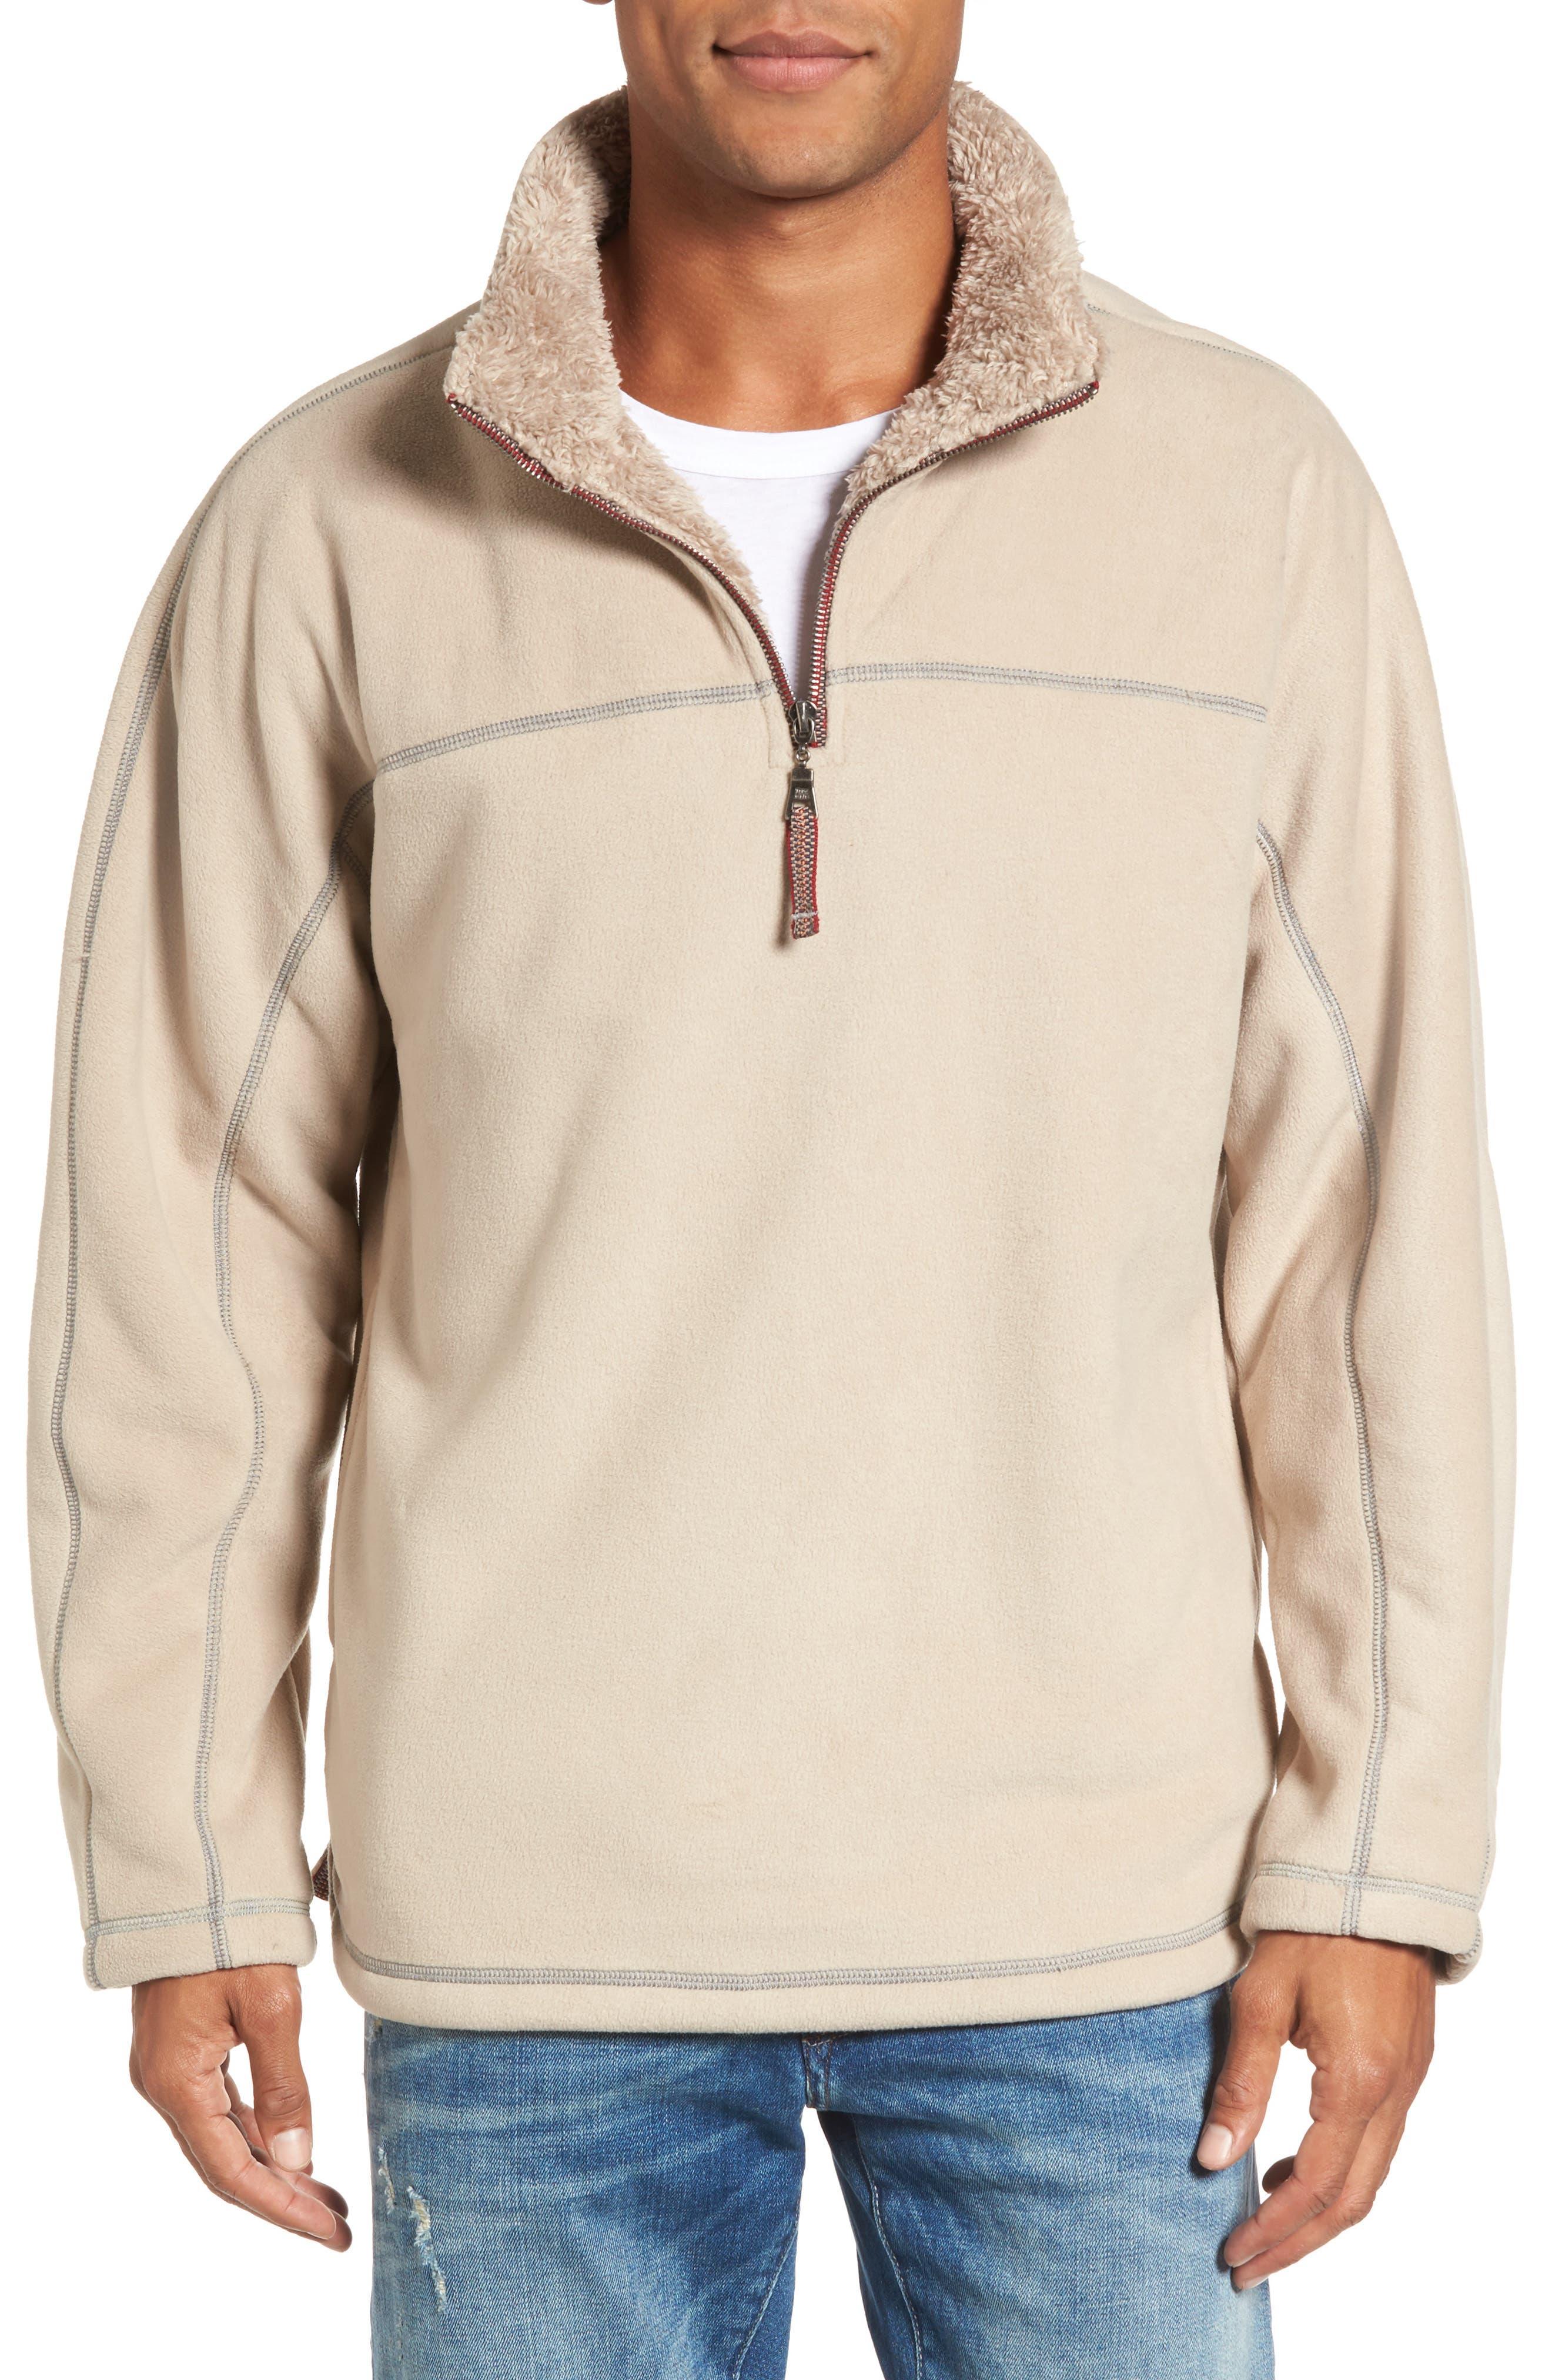 Bonded Polar Fleece Lined Pullover,                             Main thumbnail 1, color,                             249